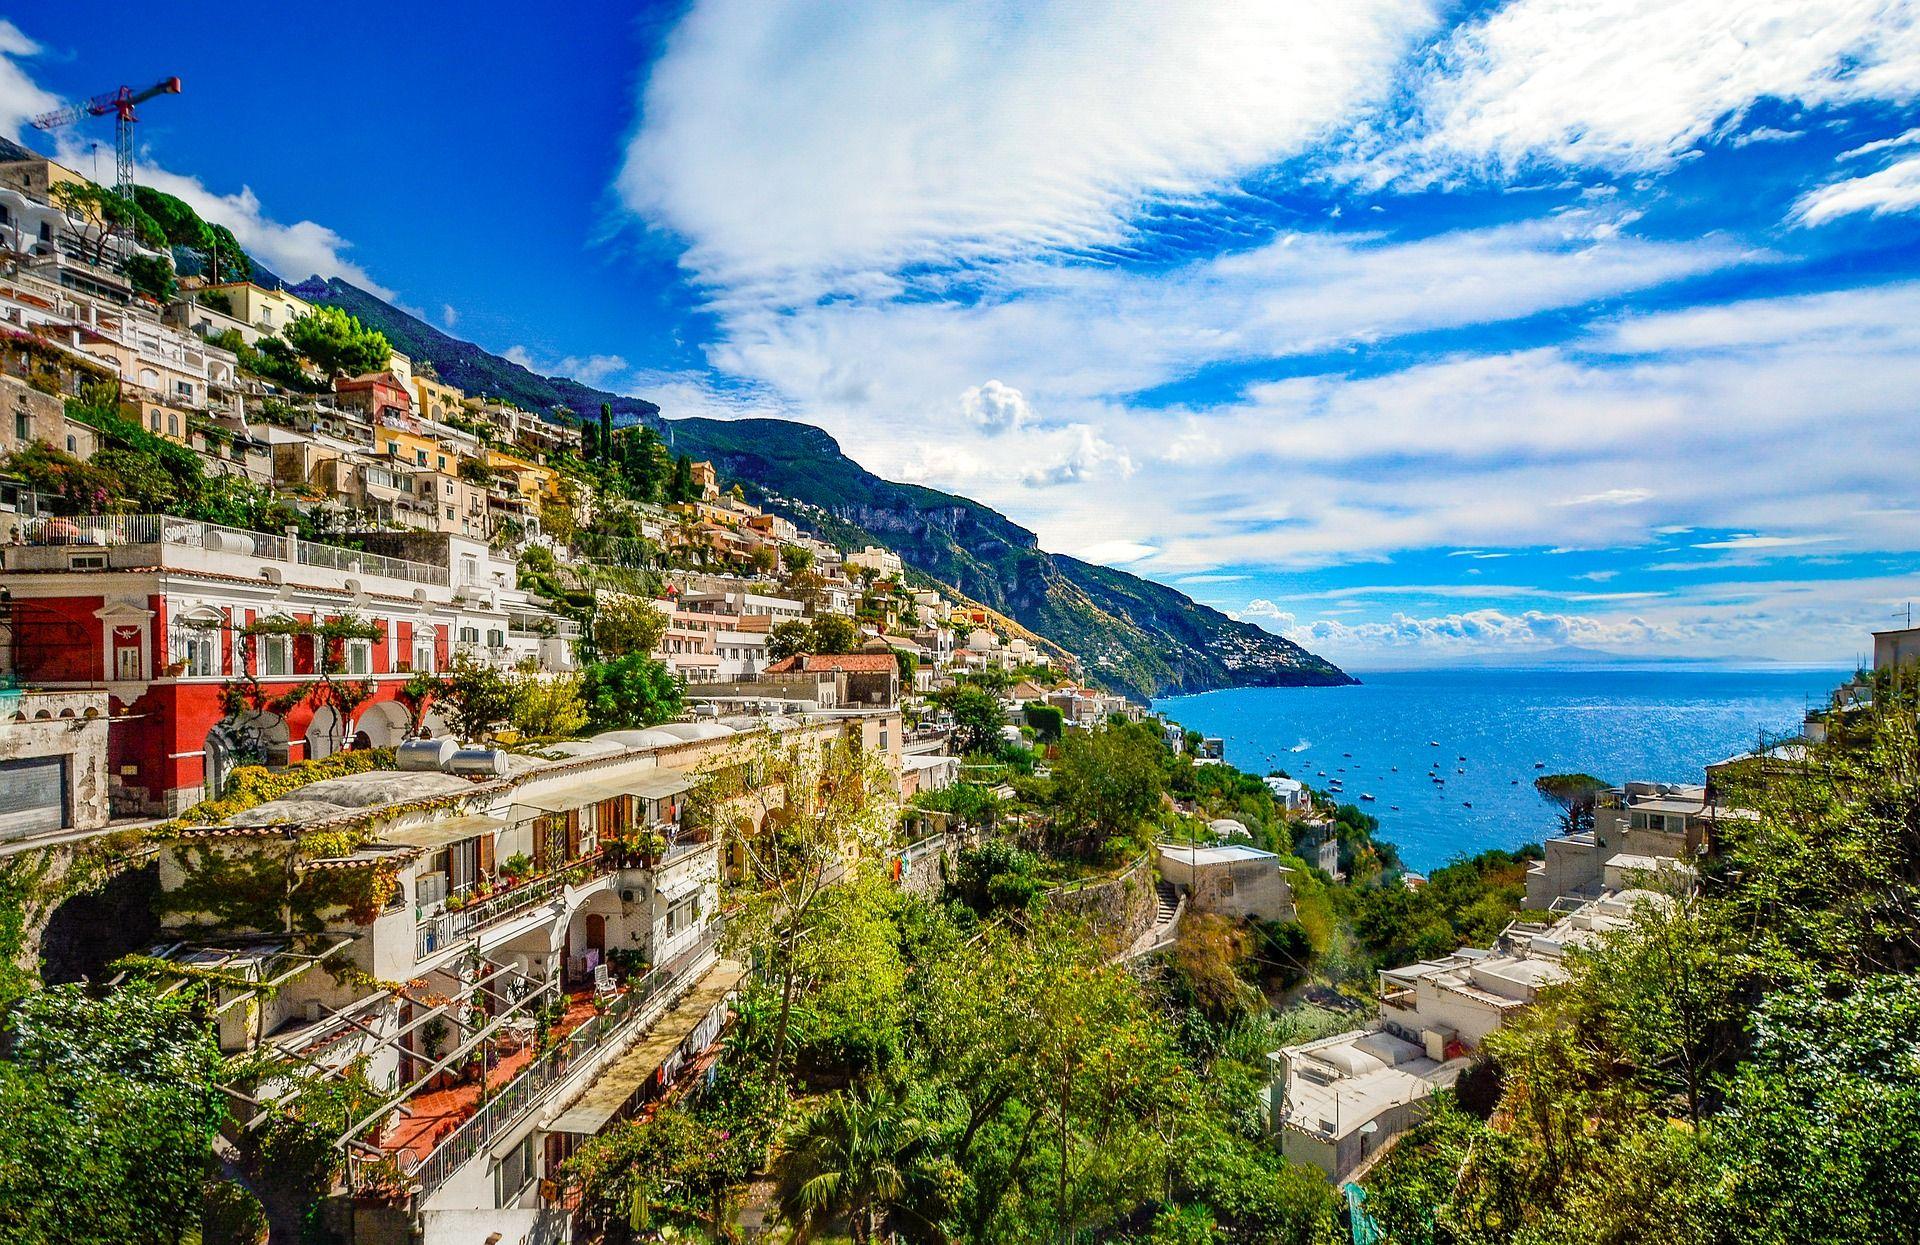 Sorrento Limos Renato Cuomo Amalfi Coast shore excursions tours in